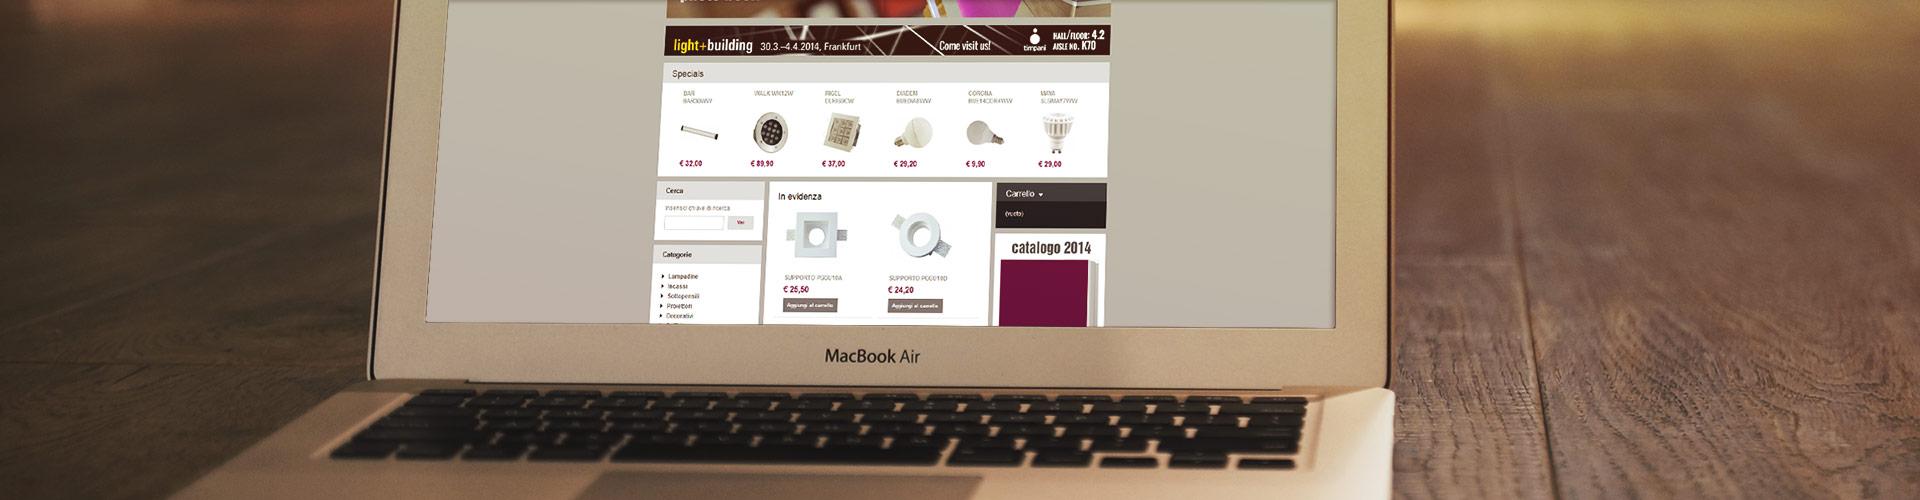 Portali E-Commerce